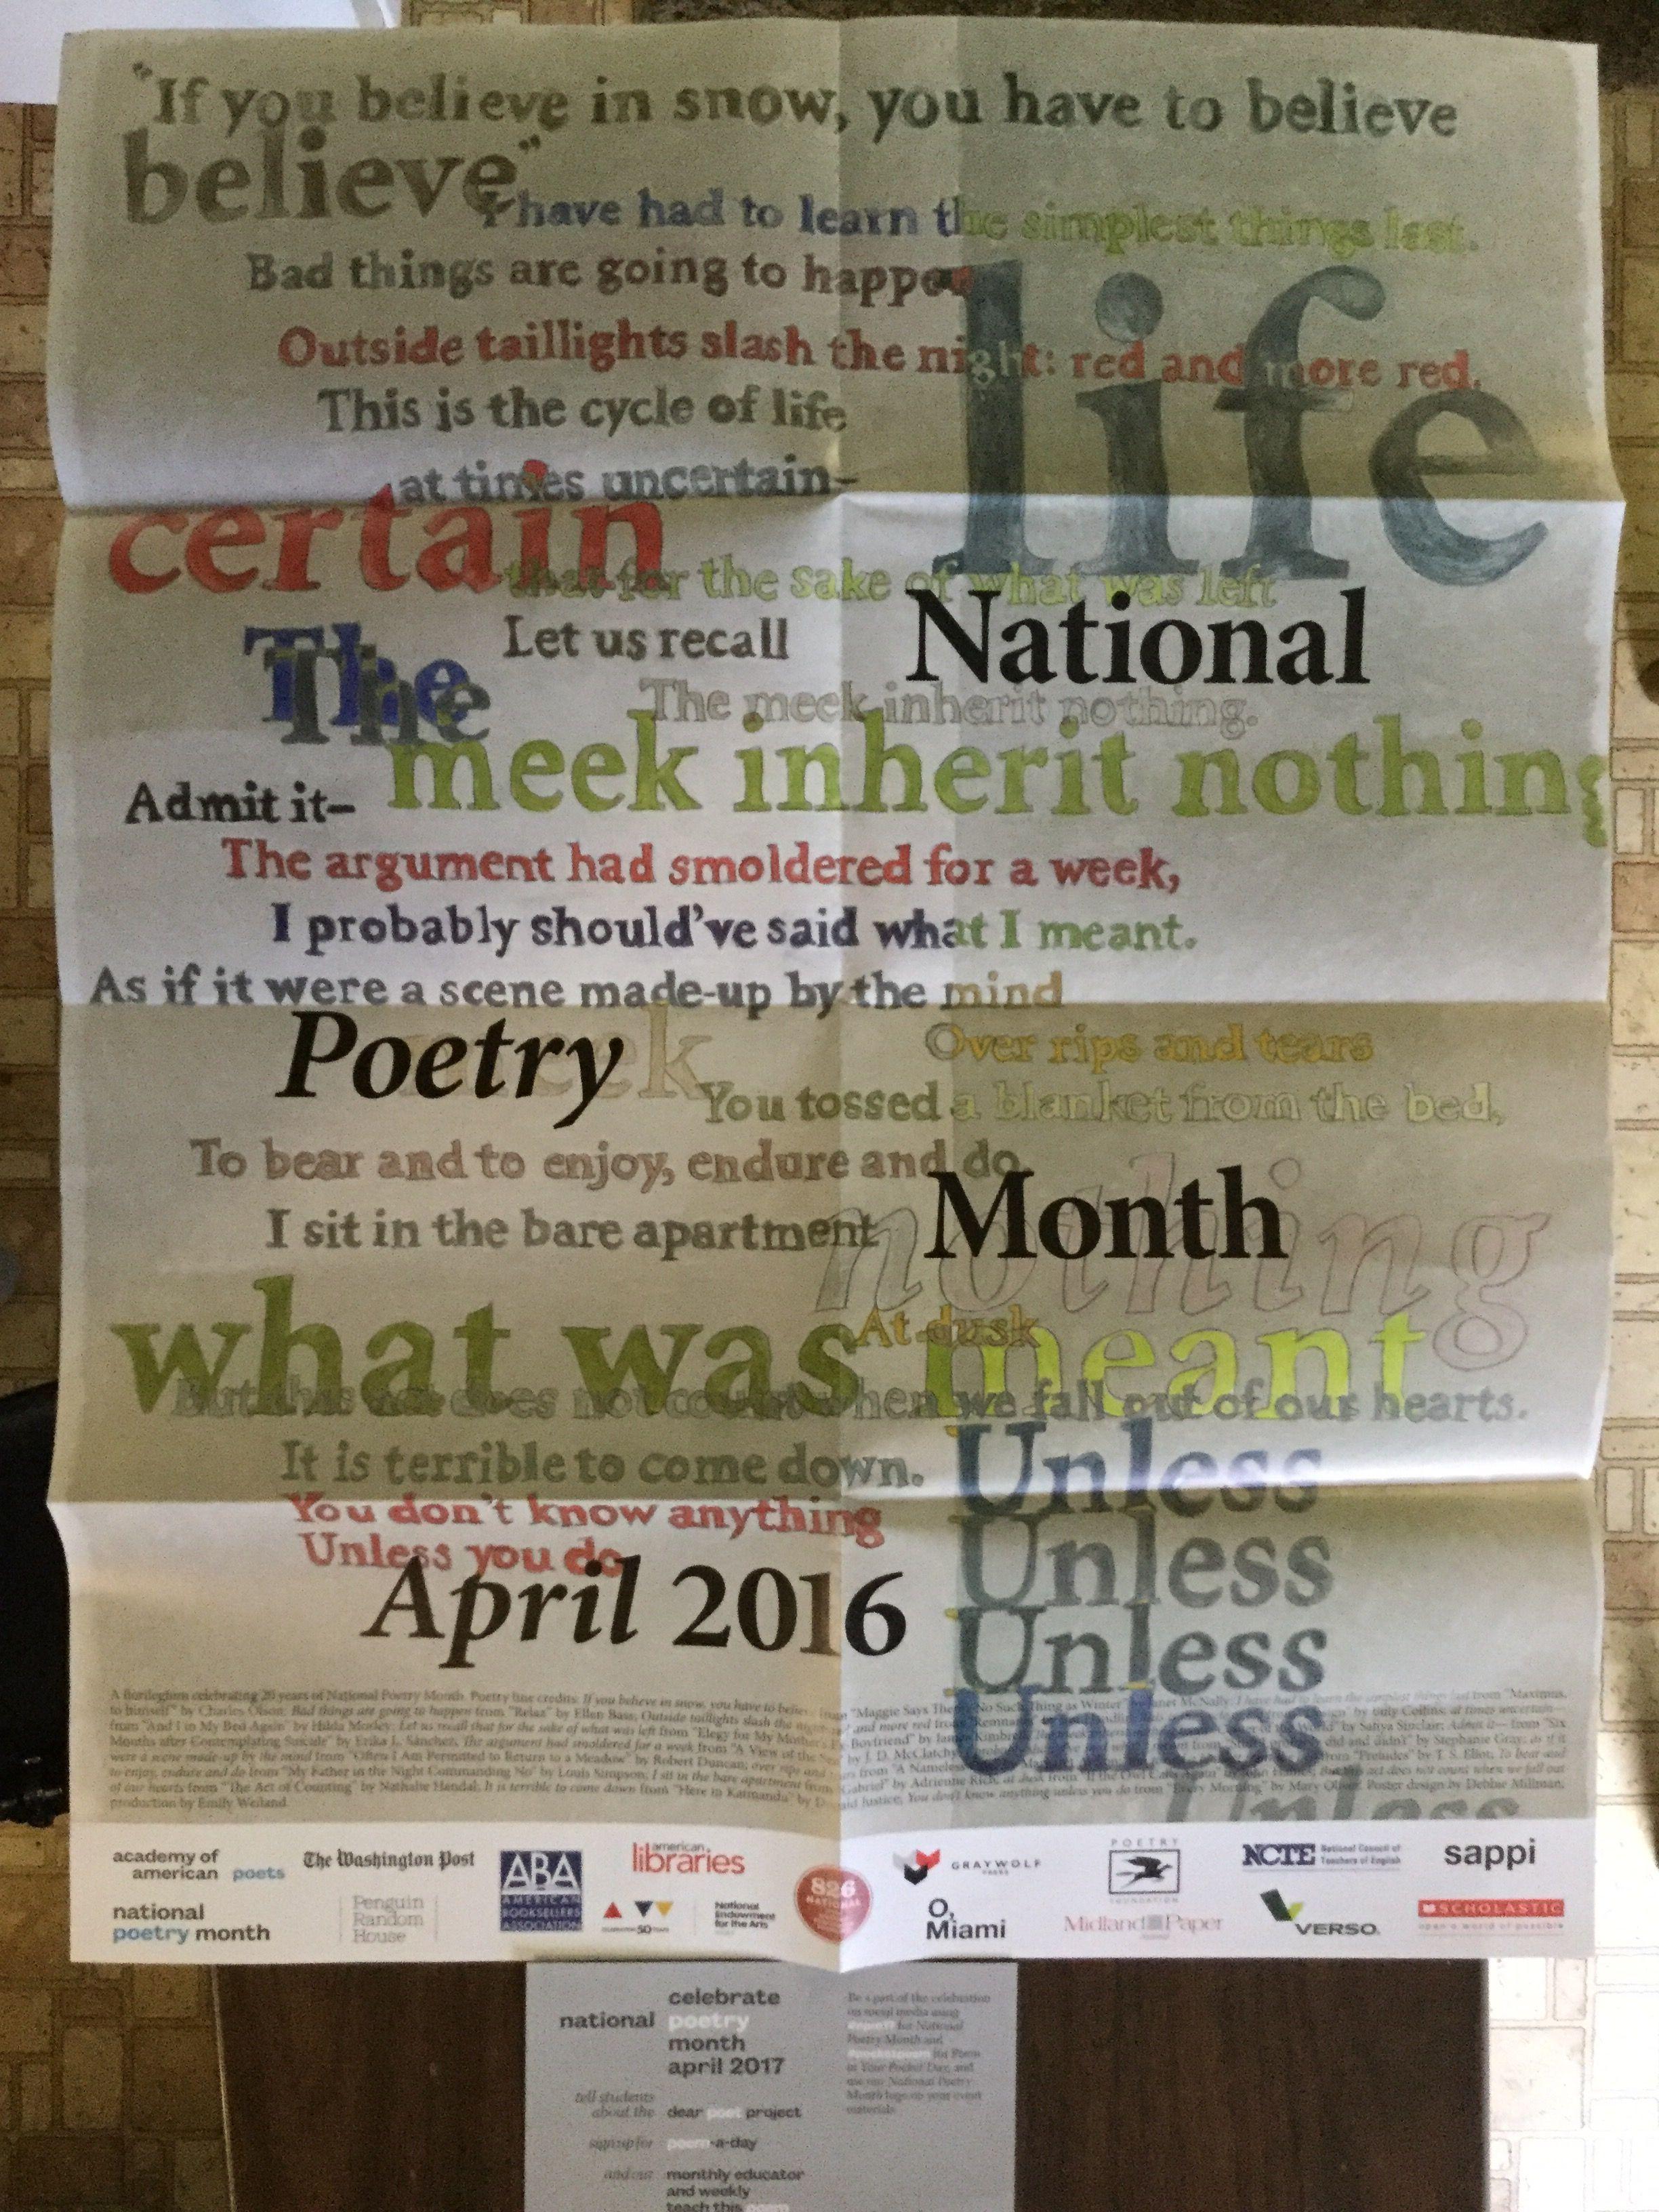 Free Academy of American Poets Poster #freestuff #freebies #samples #free